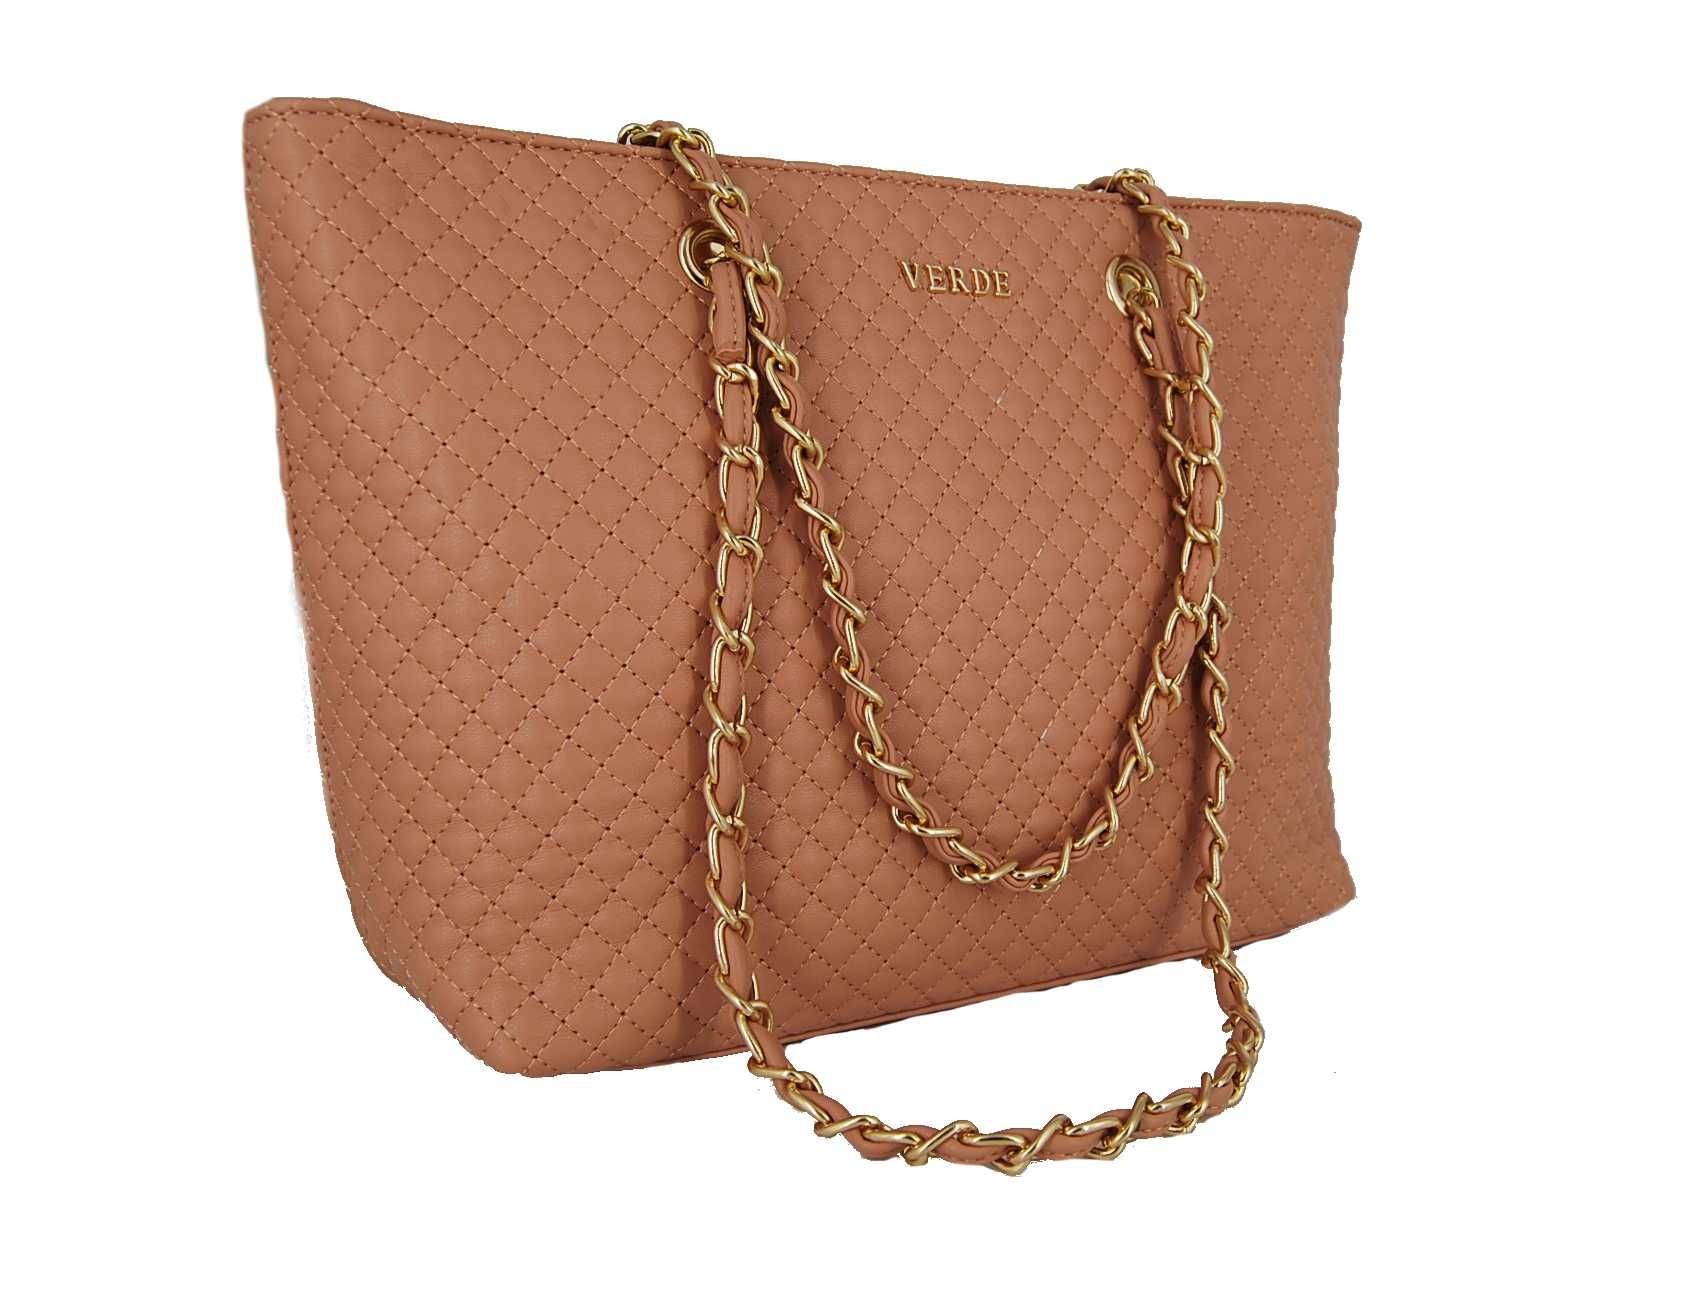 26ec942d09 Verde τσάντα ώμου ροζ με χρυσή αλυσίδα